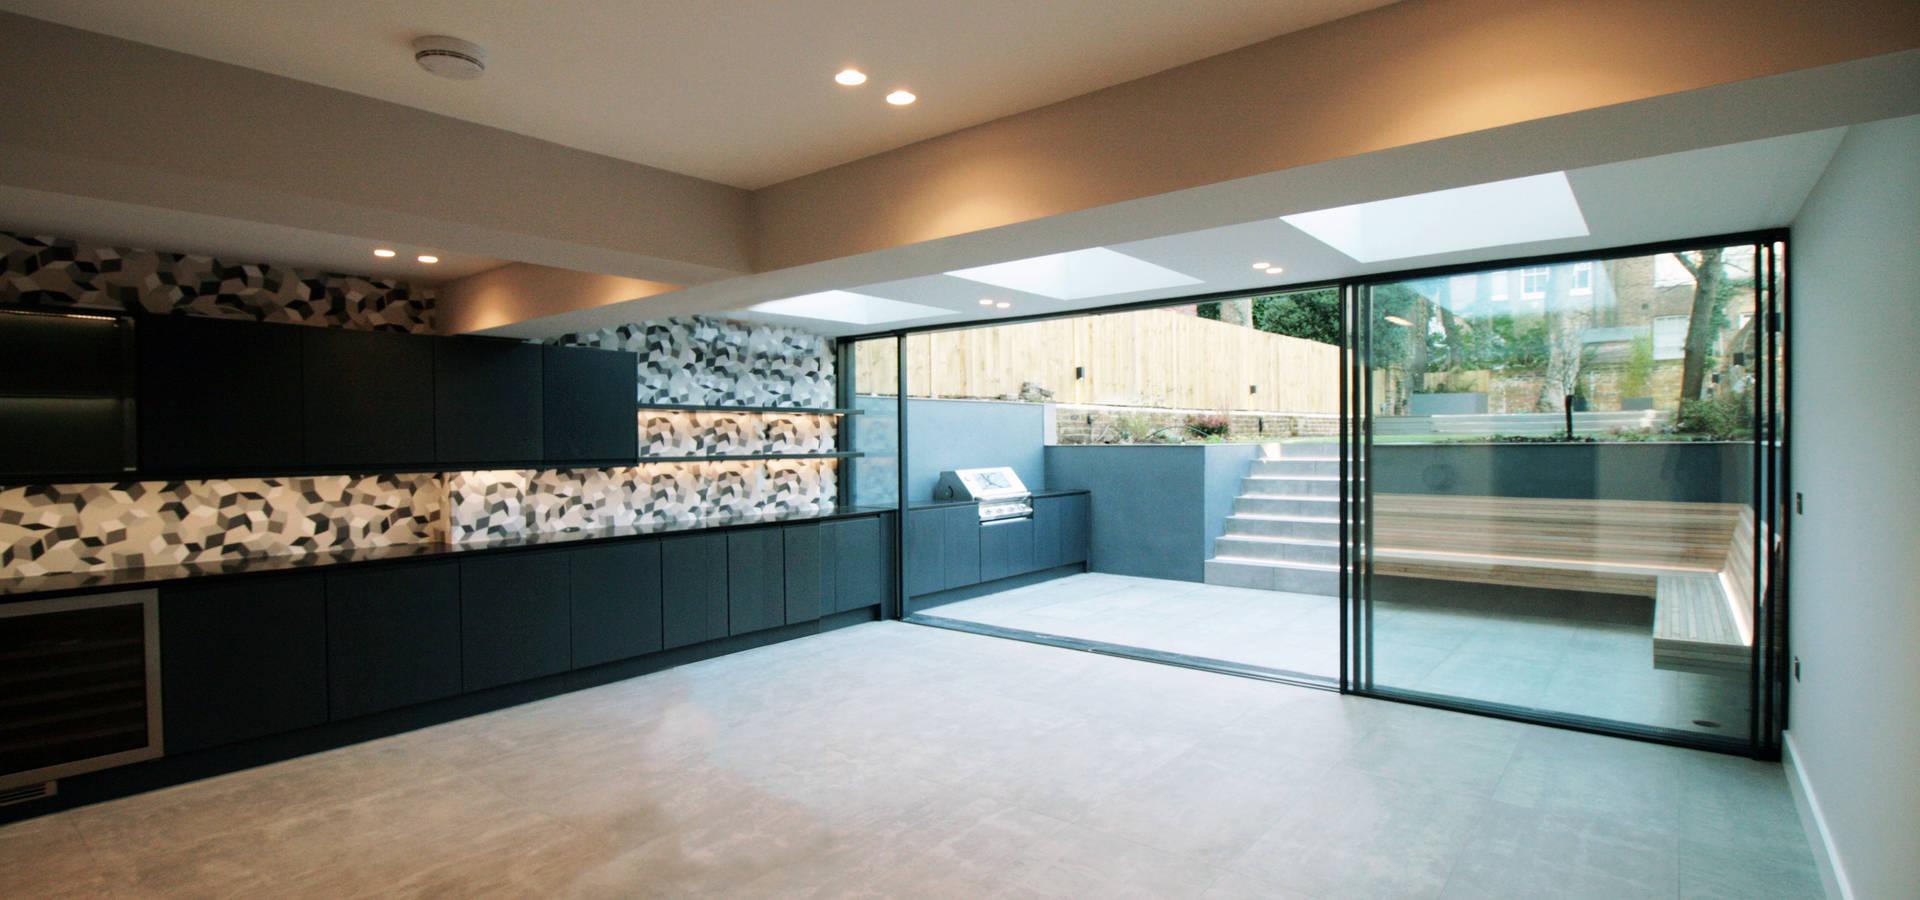 Locksley Architects